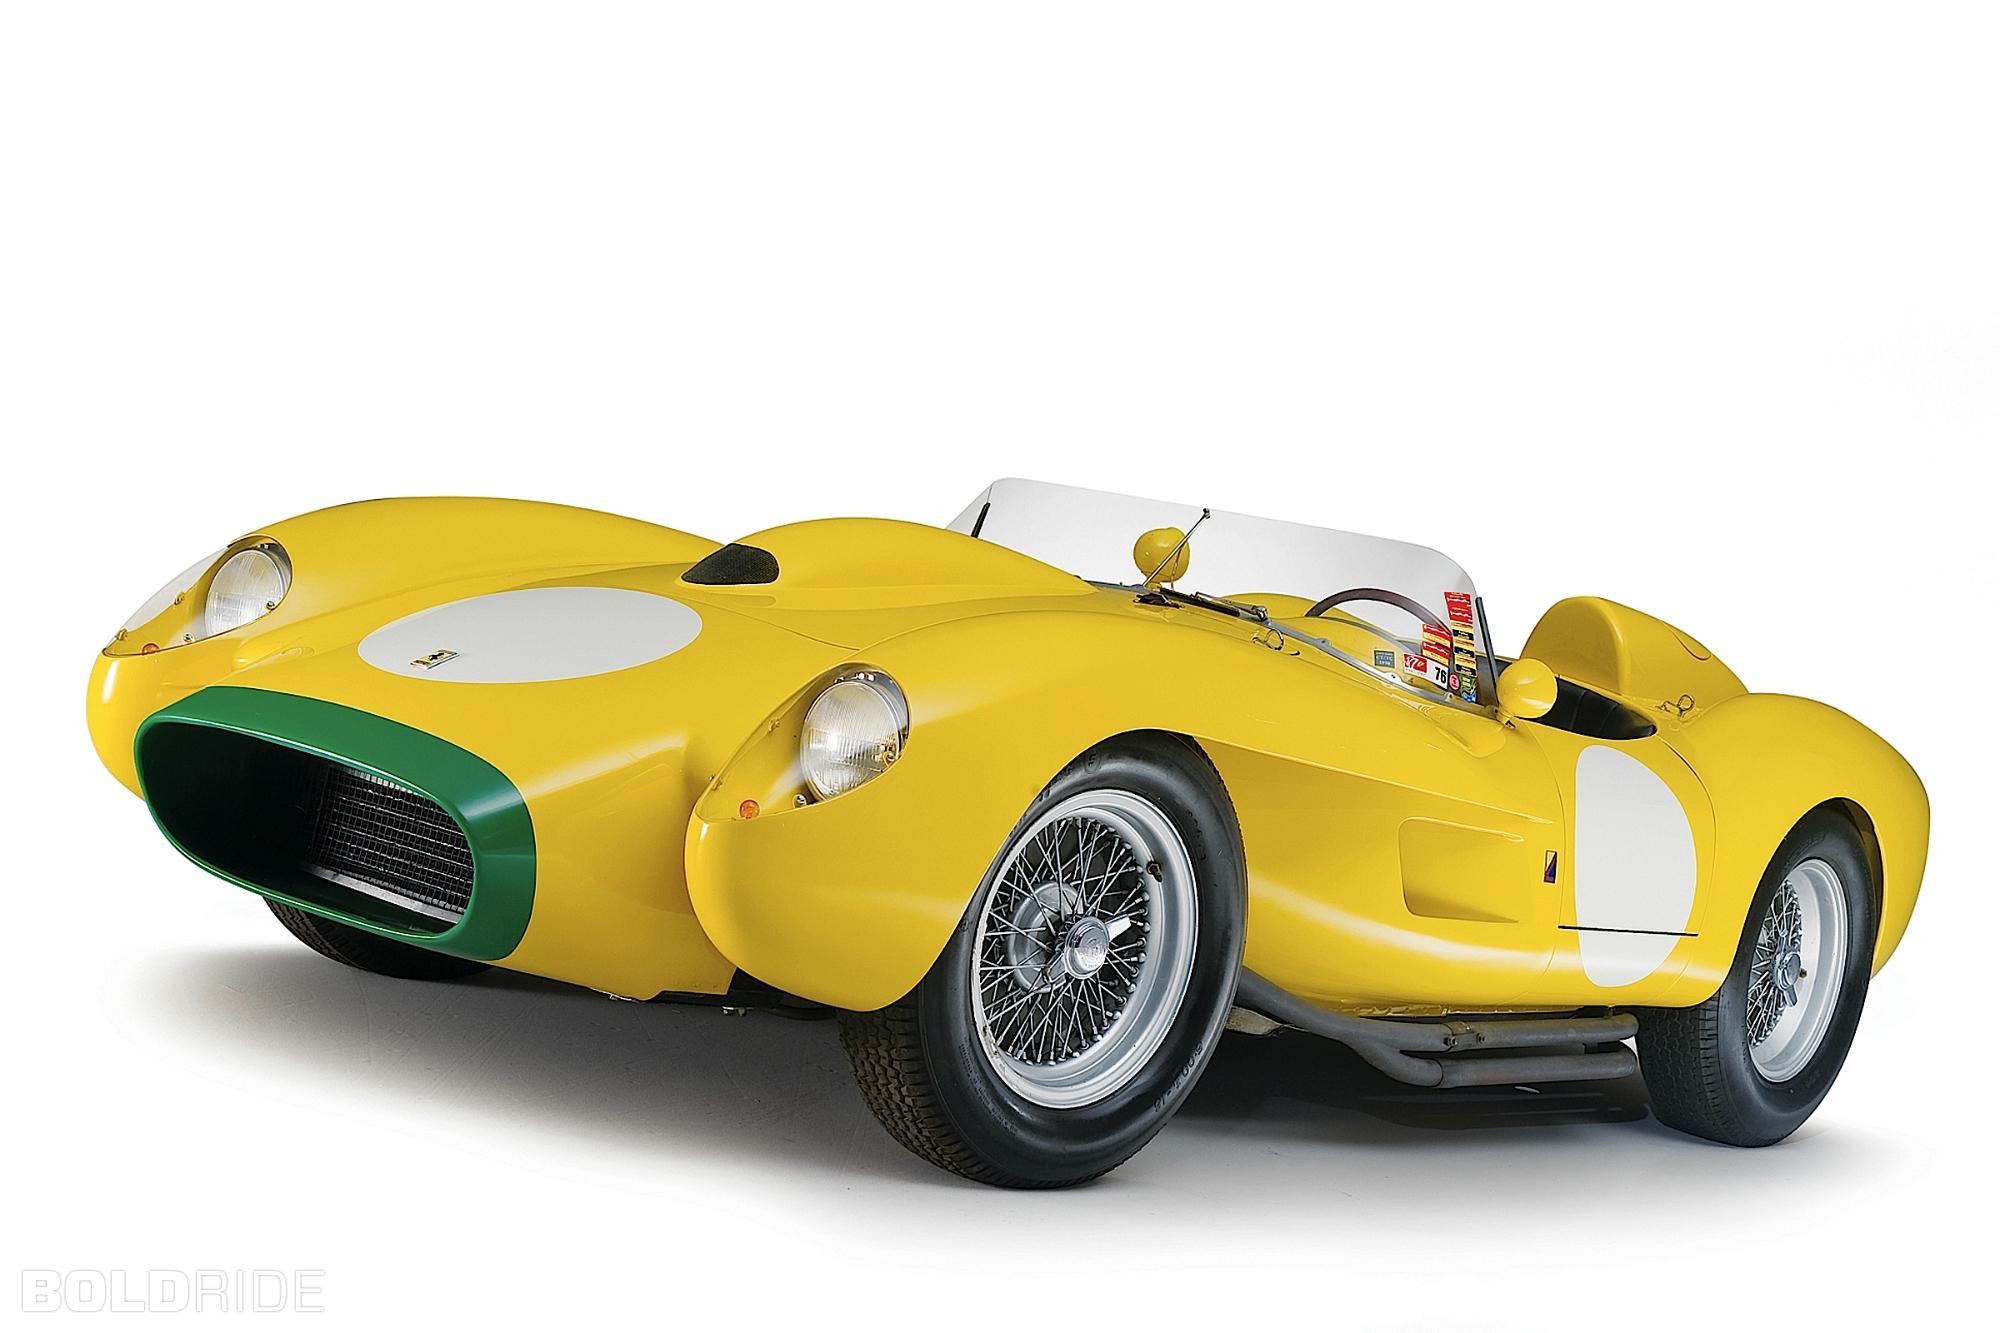 3dtuning of ferrari 250 testa rossa coupe 1957 3dtuning ferrari 250 testa rossa coupe 1957 vanachro Gallery